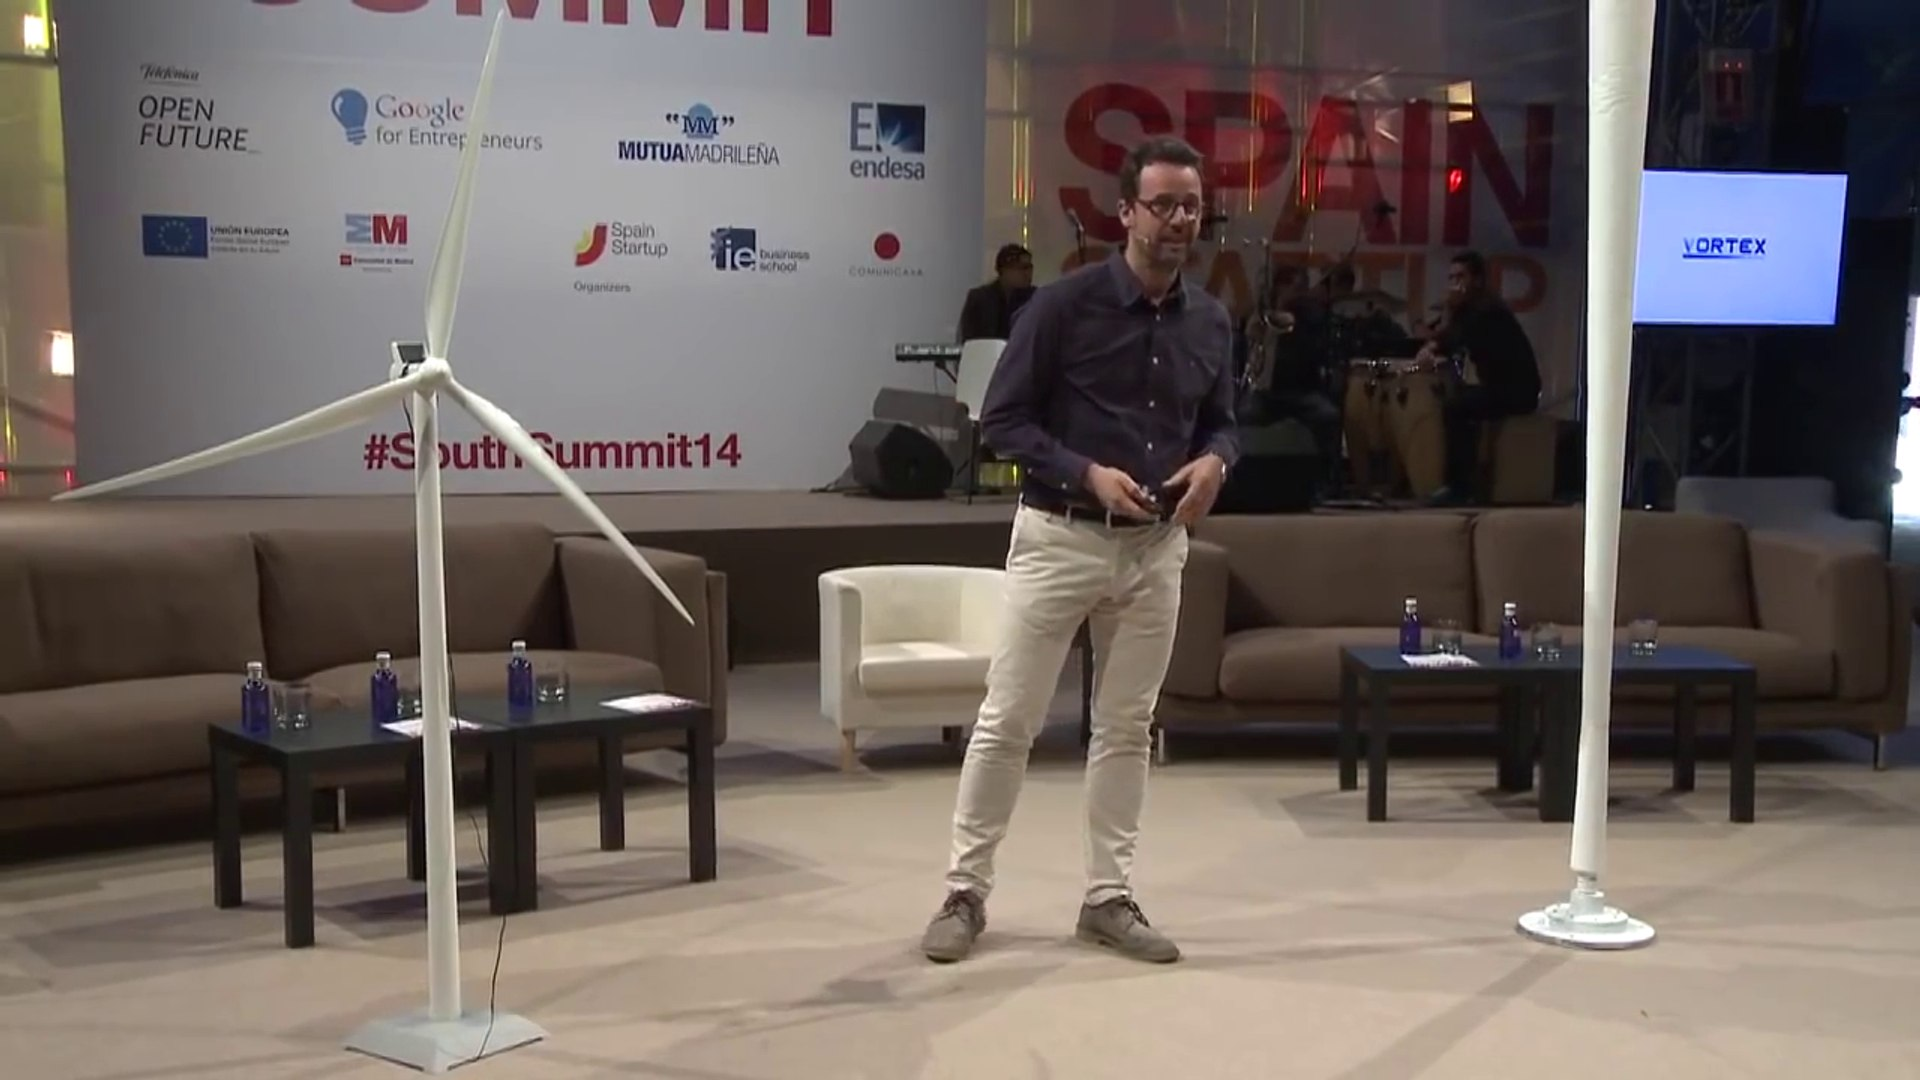 Vortex Pitch Bladeless Wind Turbine - The Summit Startup Spain Competition  2014